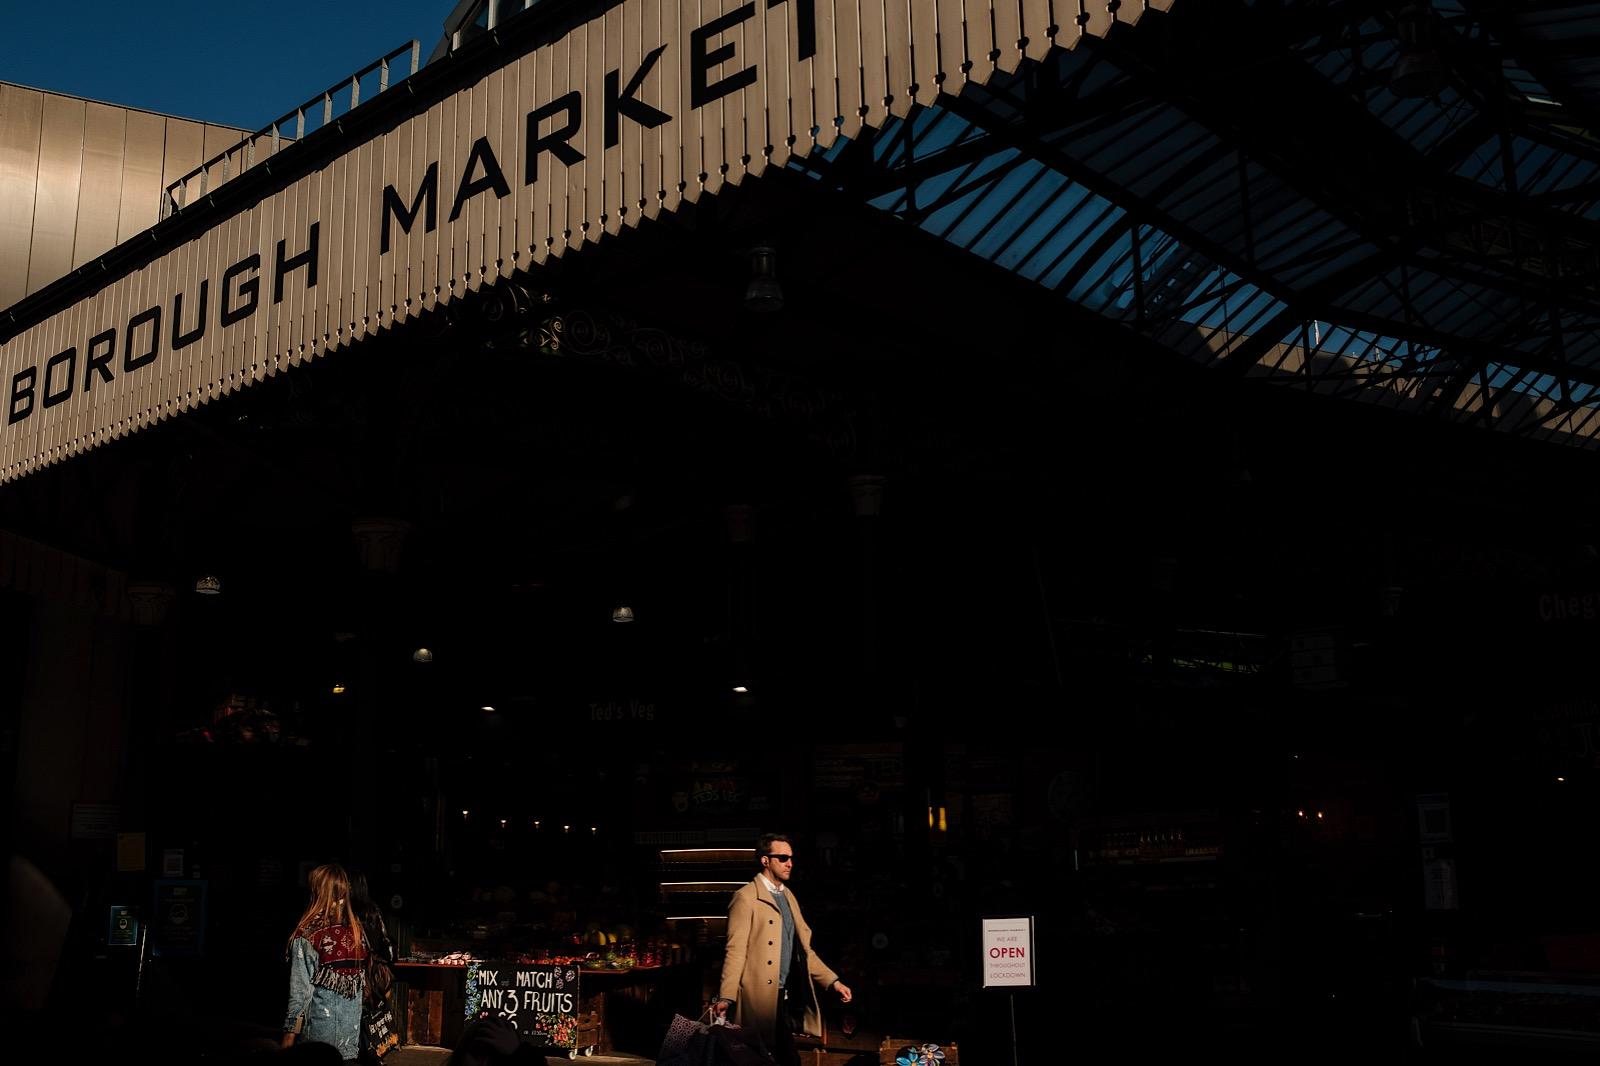 External view of Borough Market in London